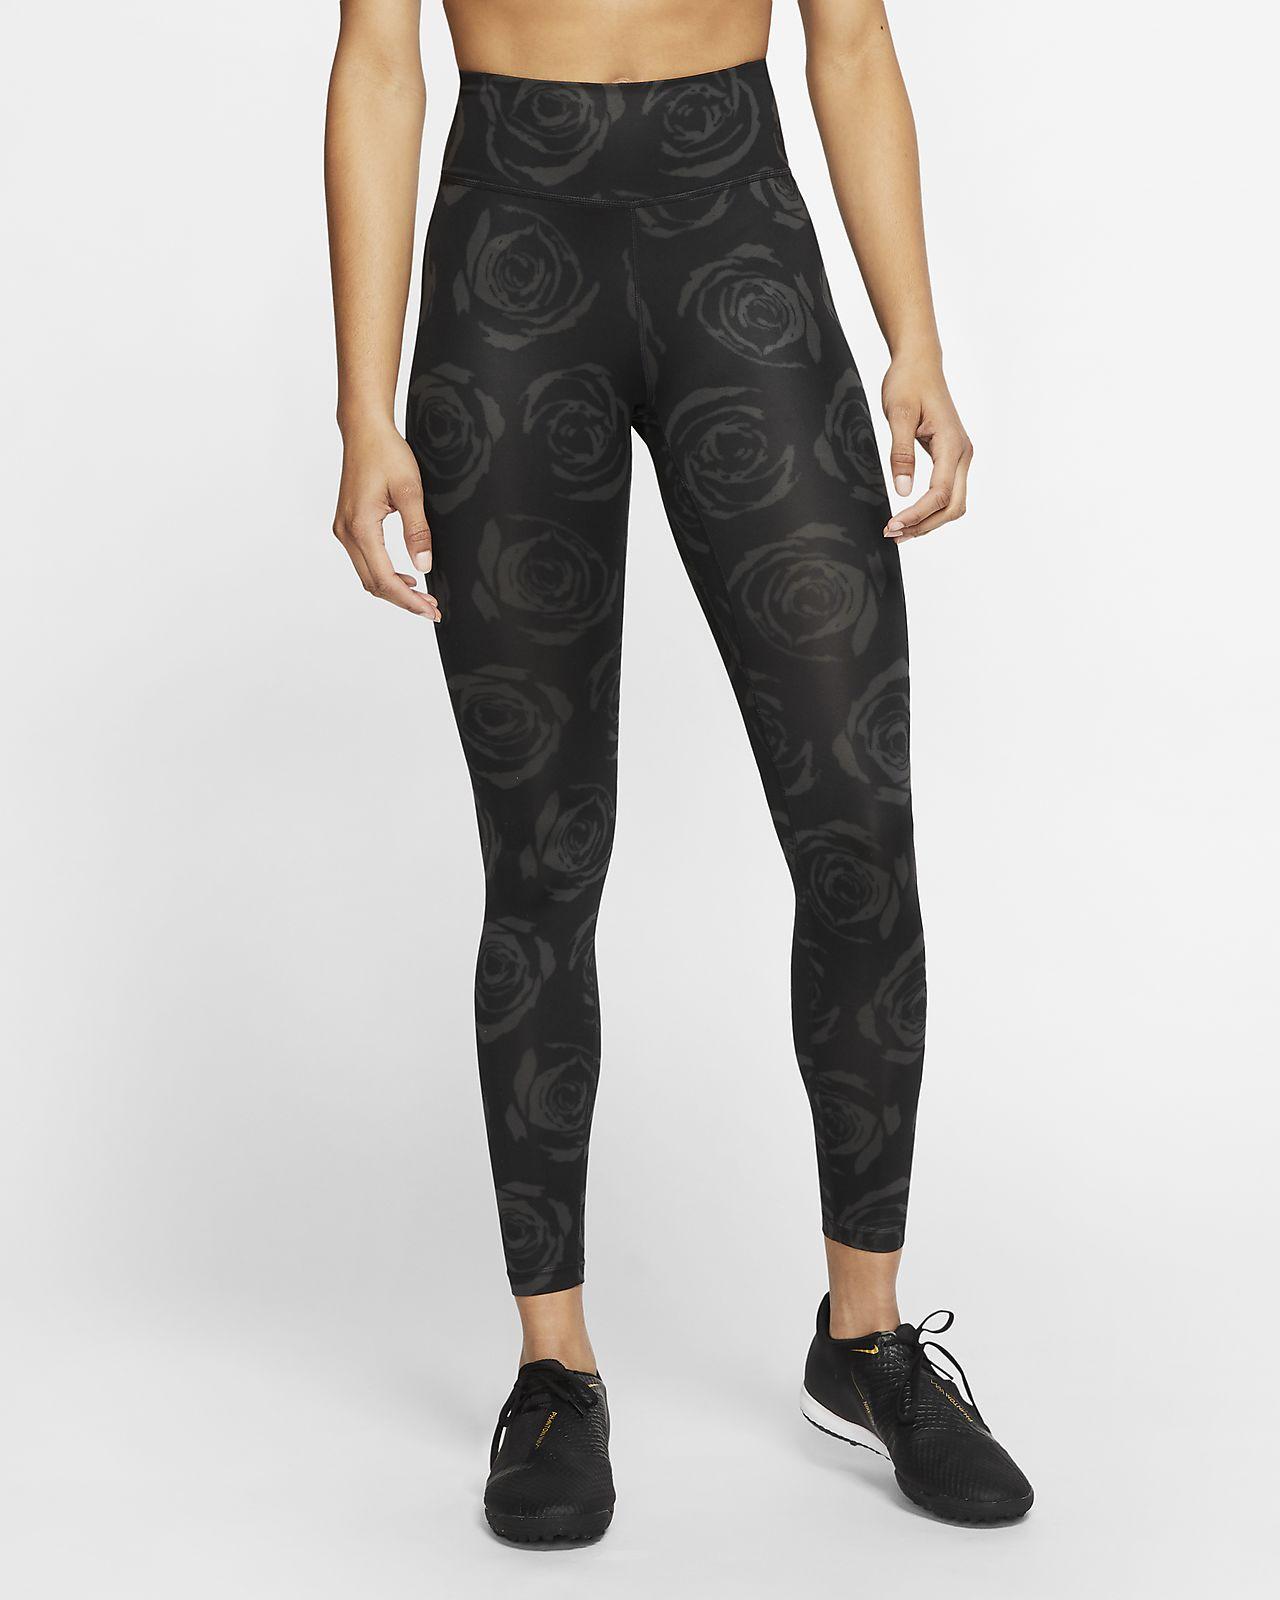 Nike One Portland Thorns FC Women's Tights